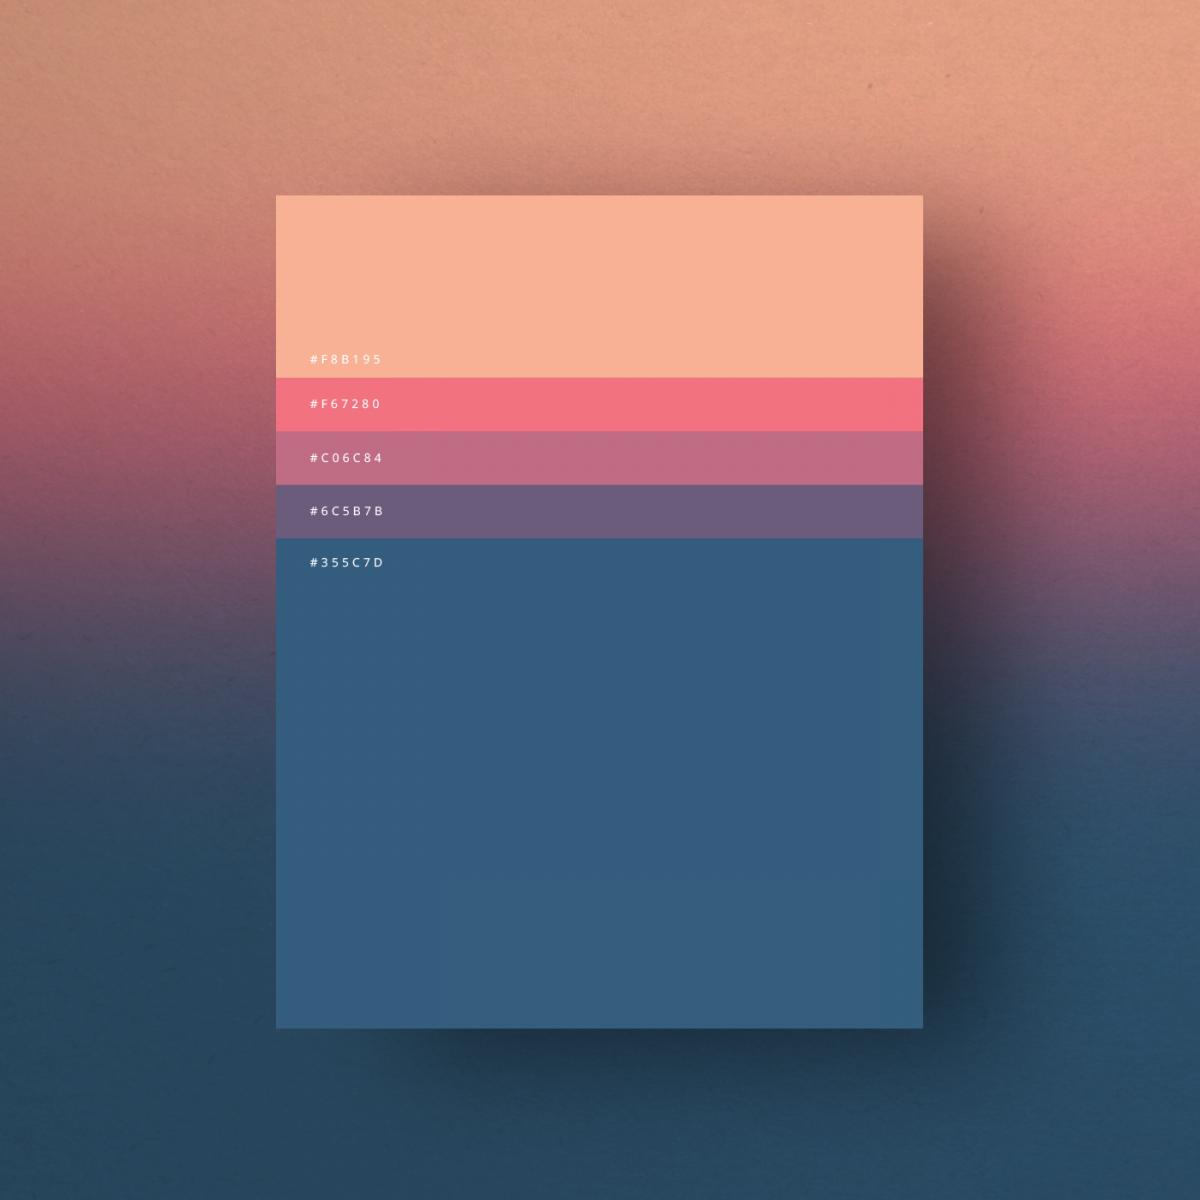 Colorful Minimalist Design: Minimalist Color Palettes 2015, Los Carteles Minimalistas